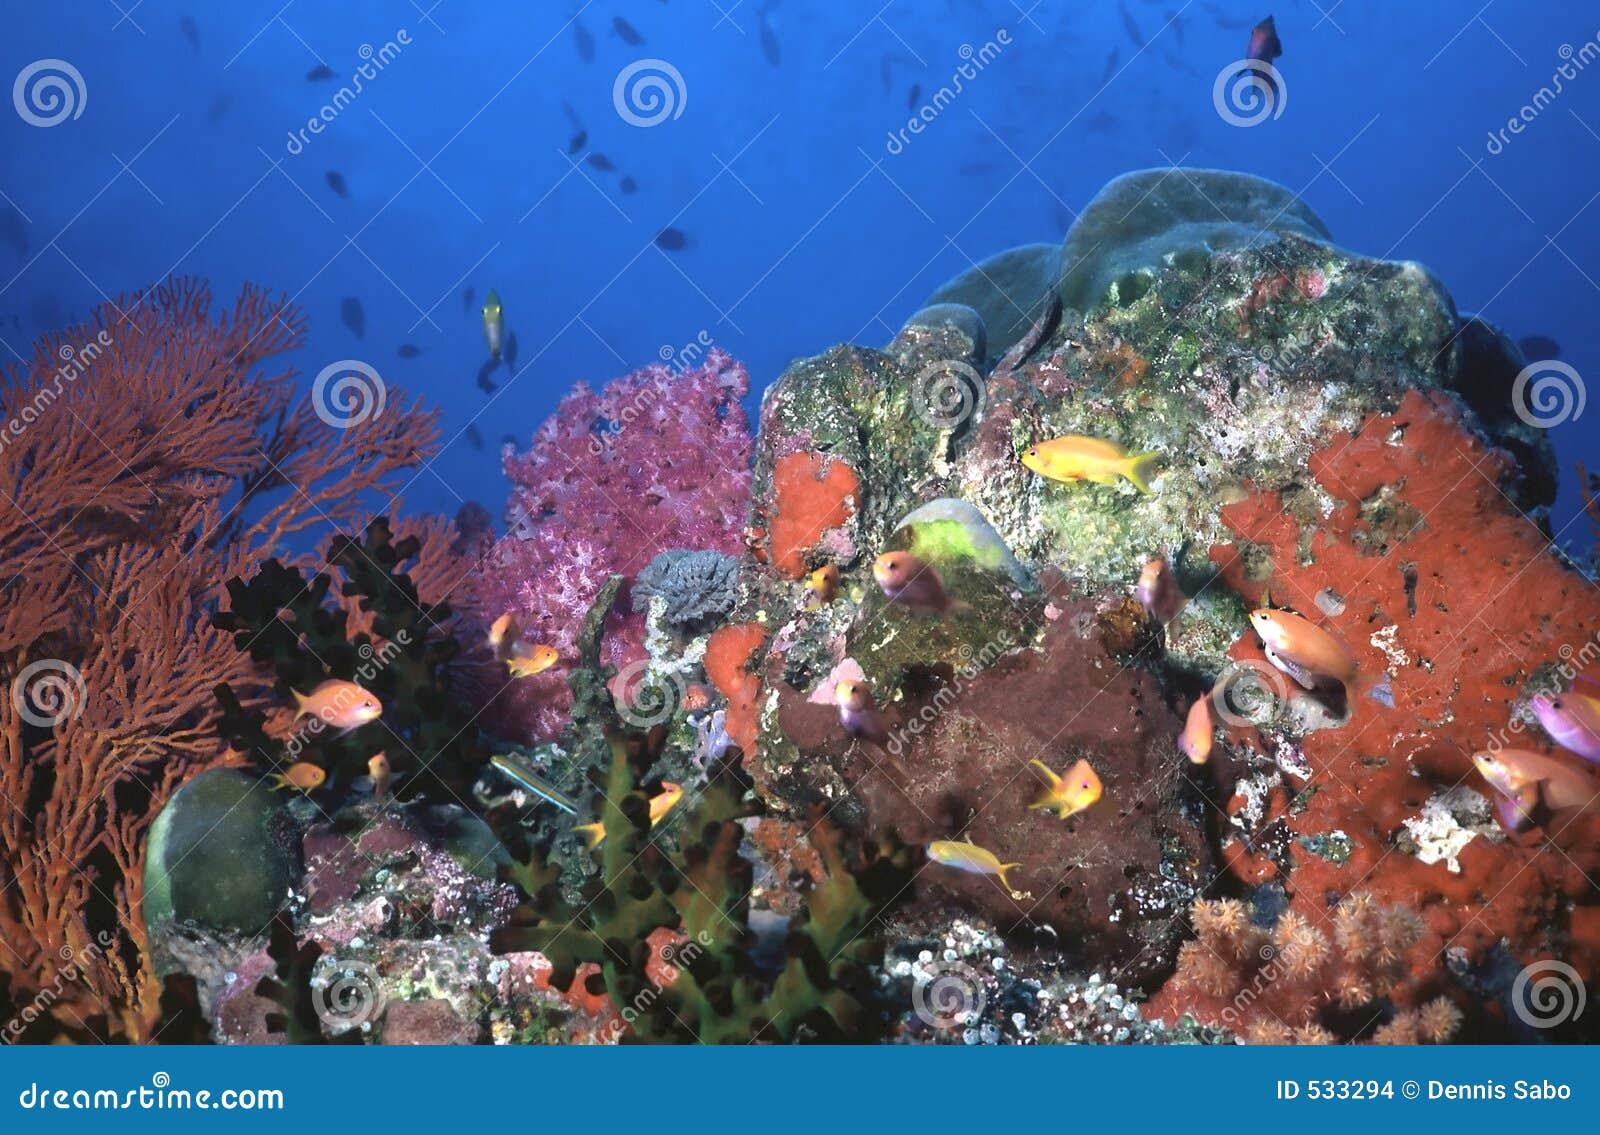 Download 水下的candyland 库存照片. 图片 包括有 魔术, 潜水员, 海洋, 珊瑚, 平静, 神秘, 旅游业 - 533294